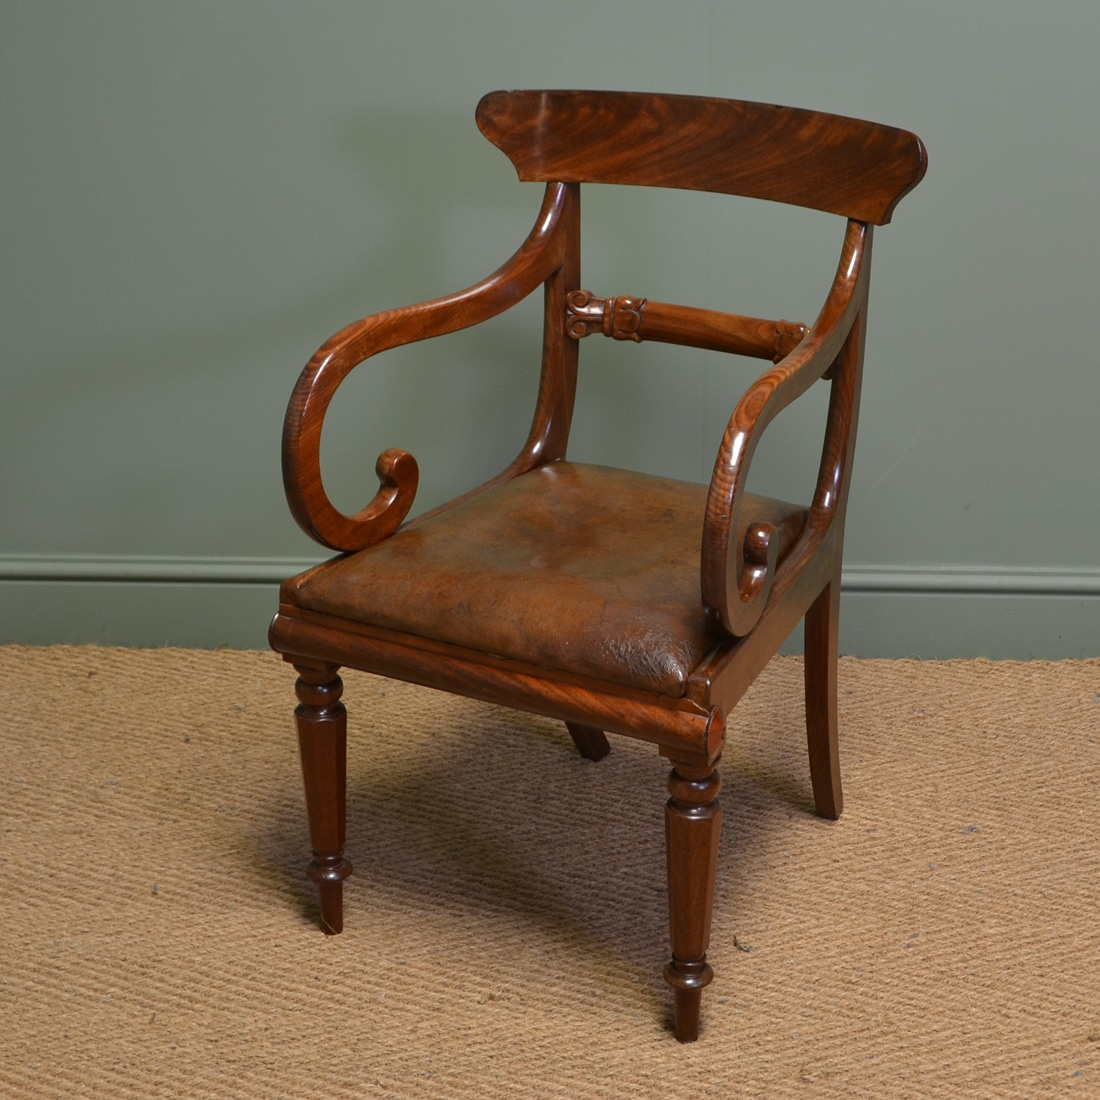 antique leather chair repair stool hong kong spectacular georgian mahogany and desk